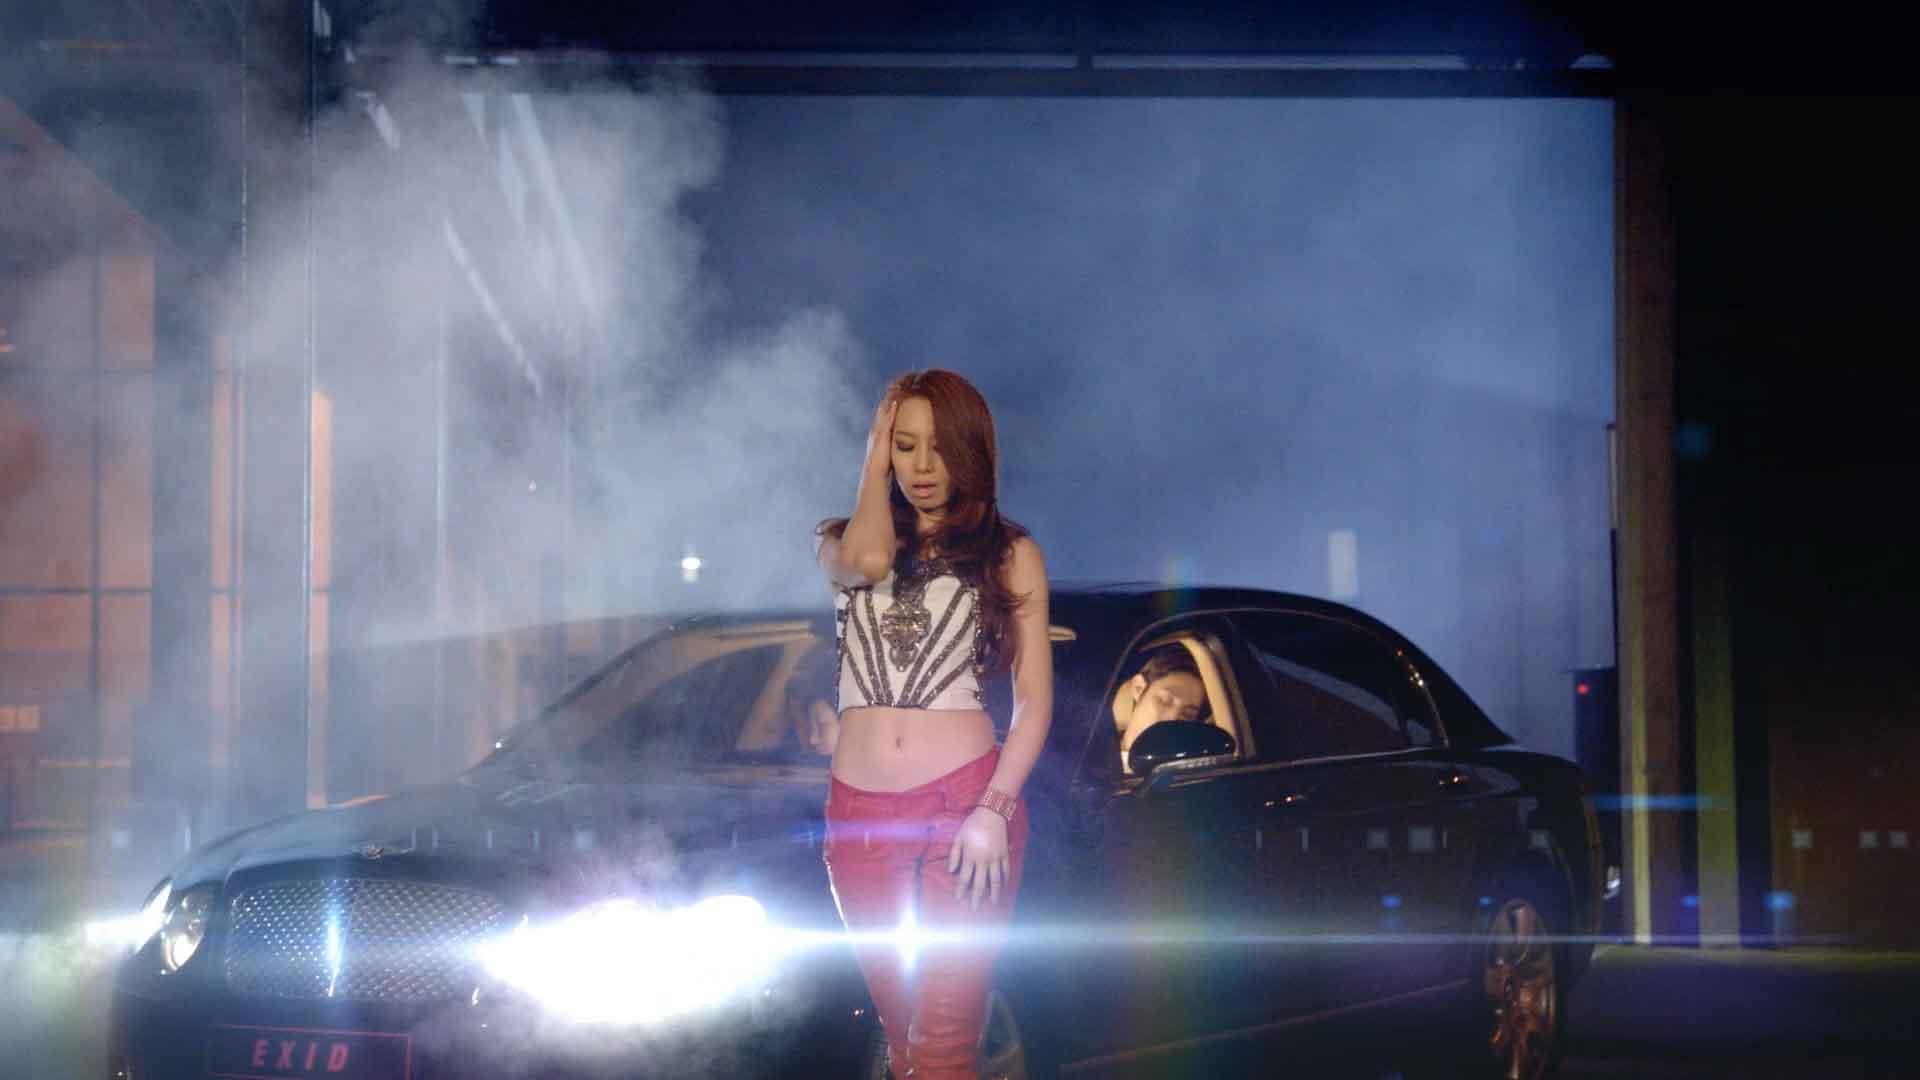 [1080P] EXID - Whoz That Girl(Melon - 296M)